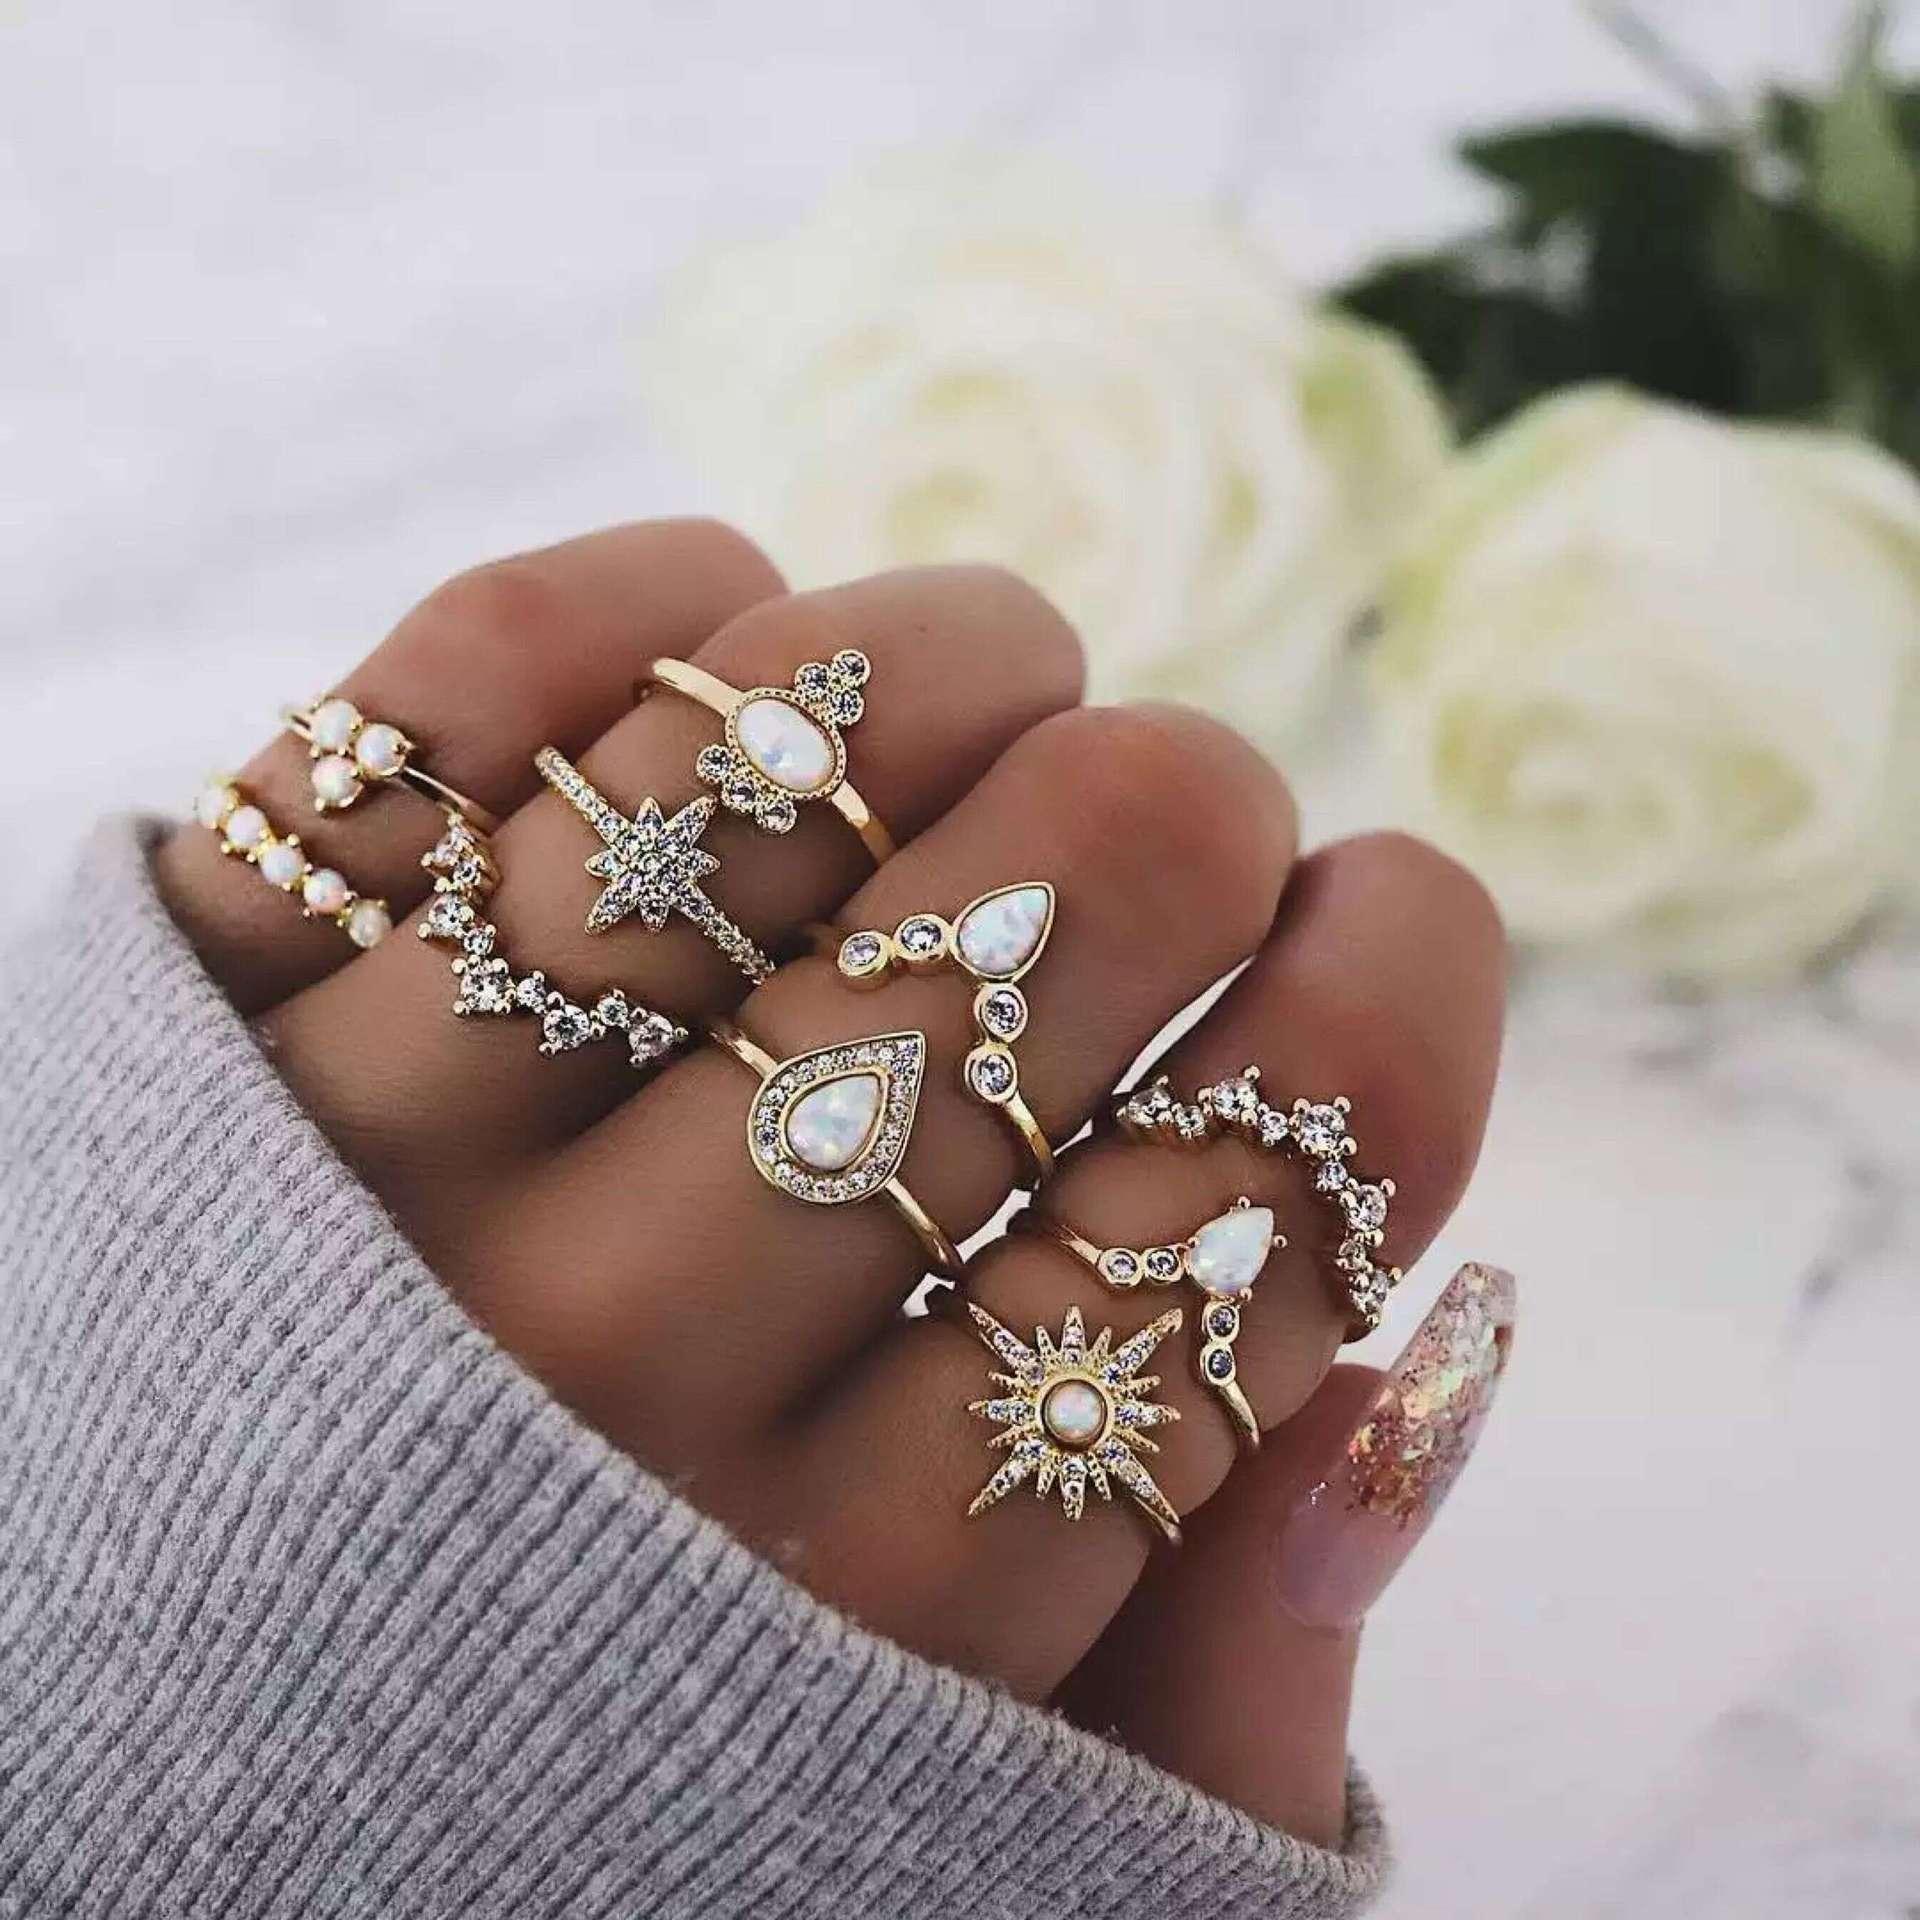 10 unids/set anillo de dedo Midi con gotas de agua cristalina estrellas Retro bohemias para mujer regalo de aniversario de boda RJ-290